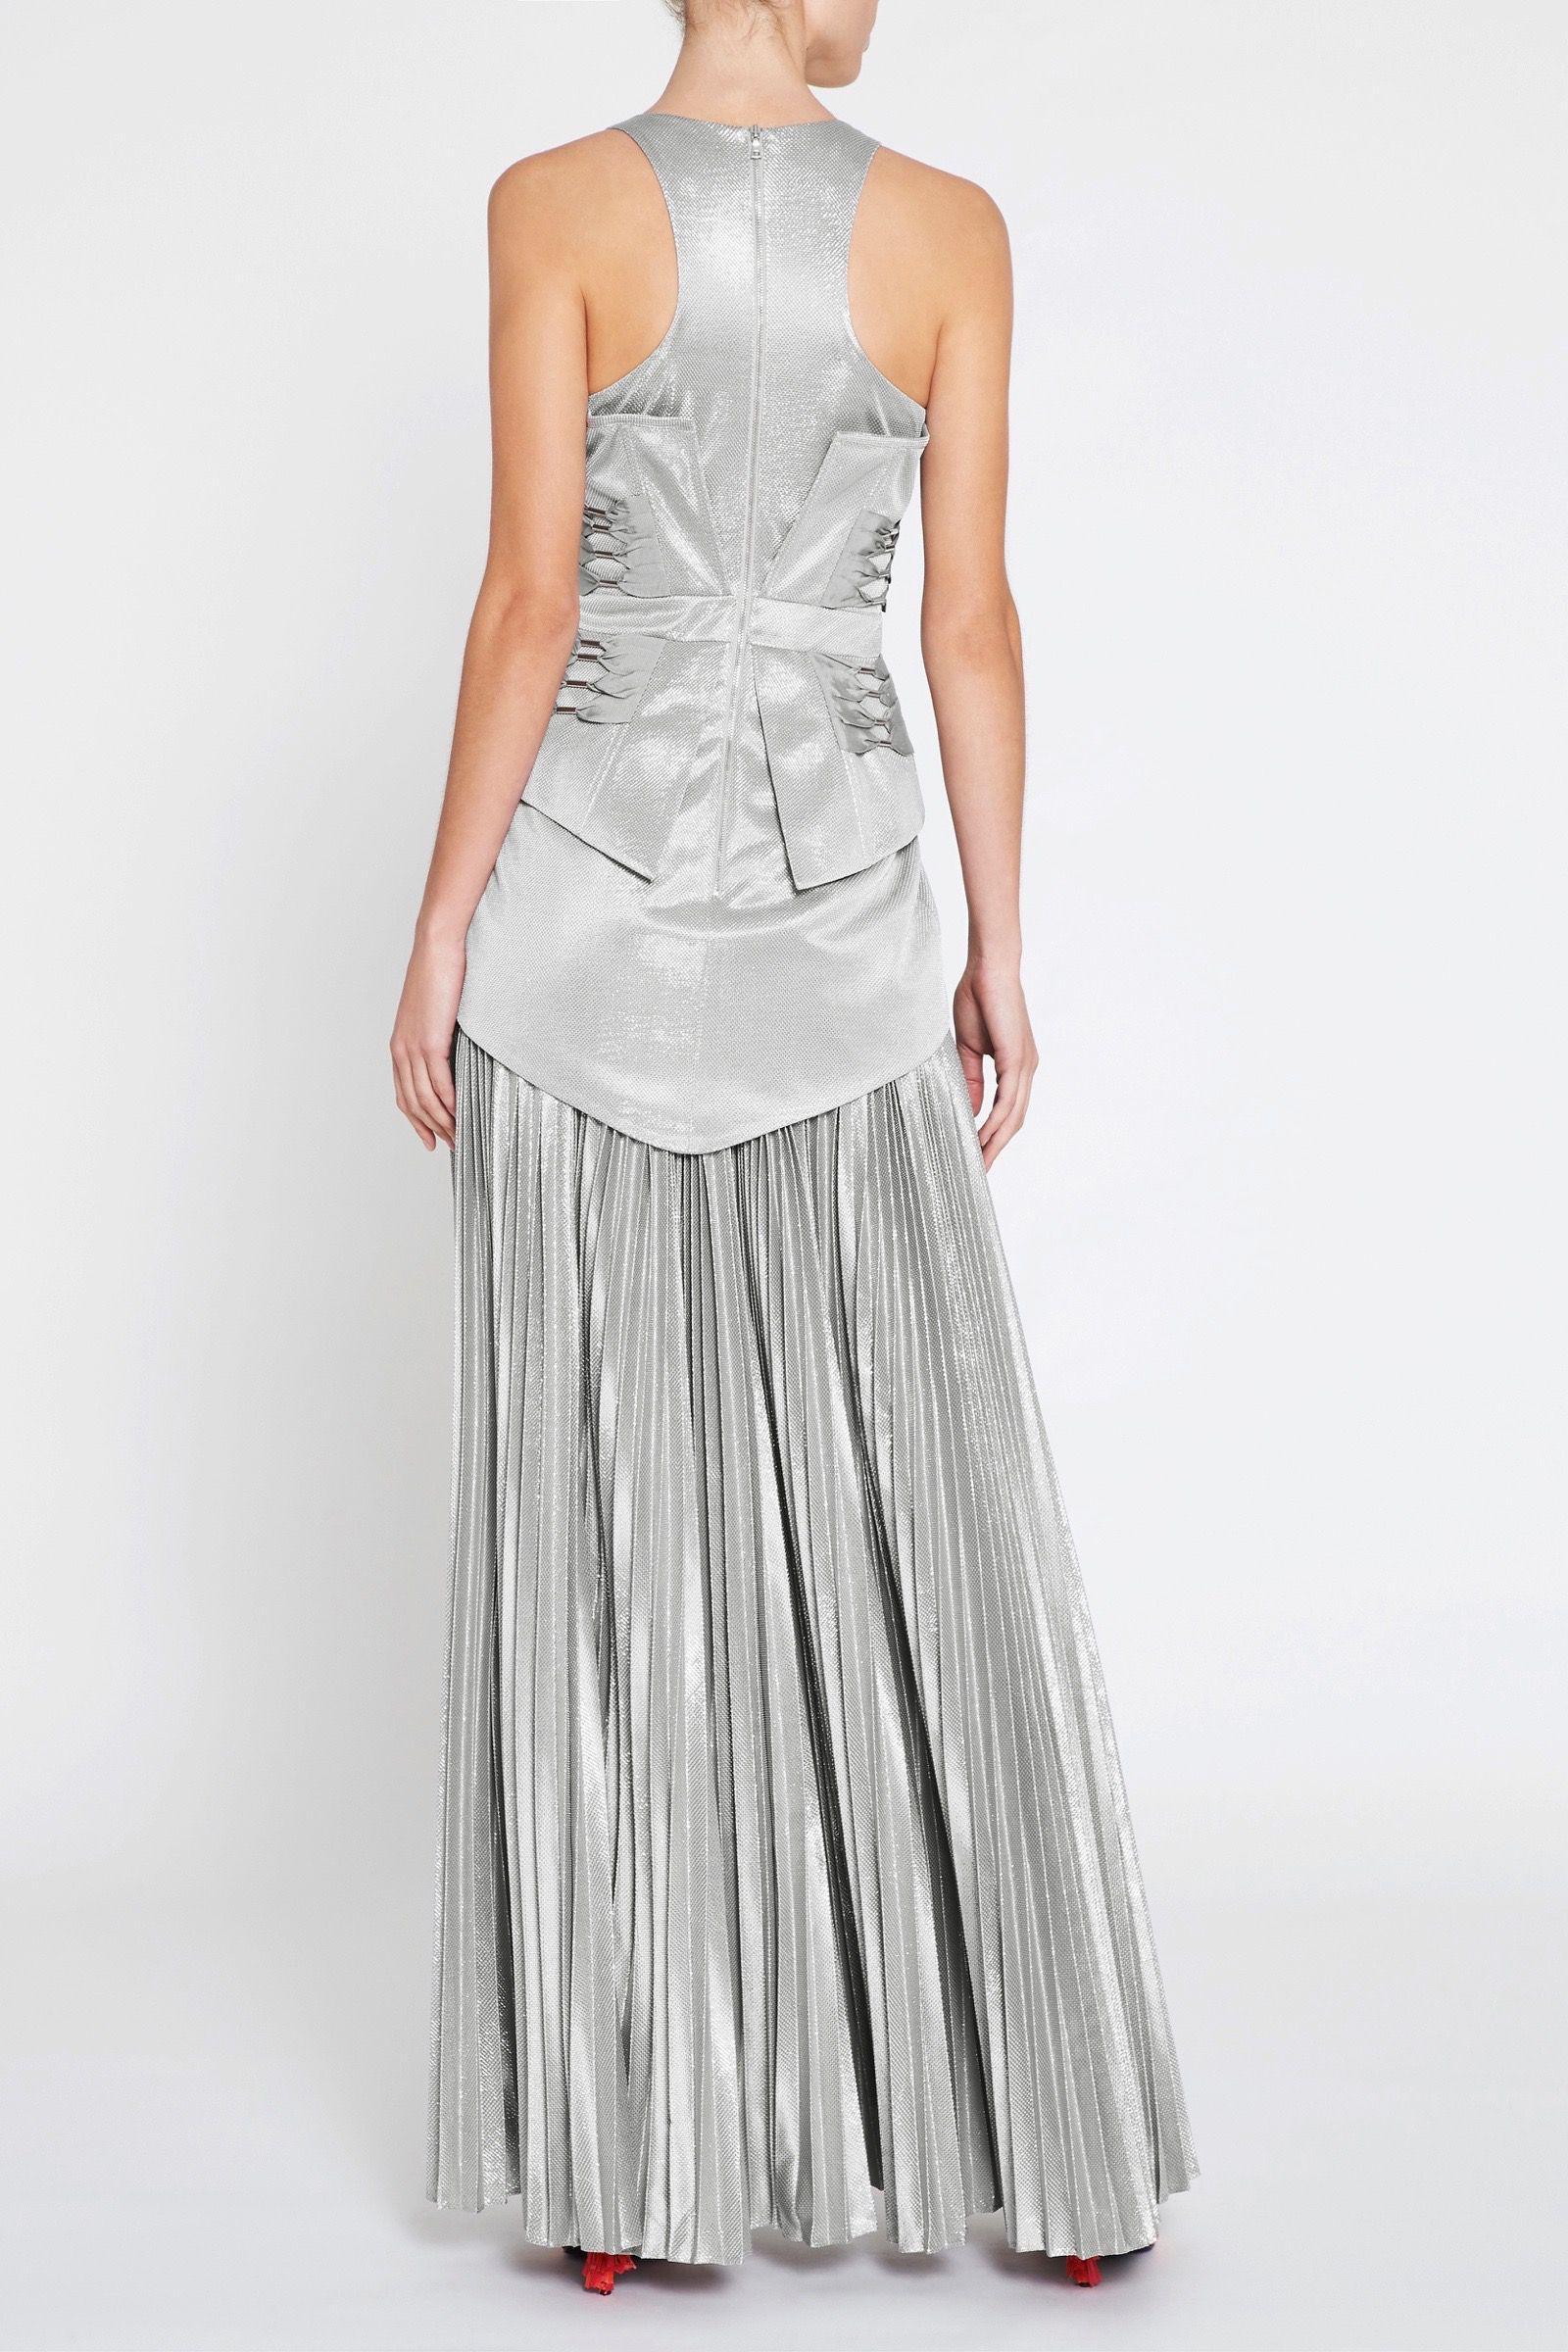 Sass Bide Synthetic The Utopian Dress In Silver Metallic Lyst